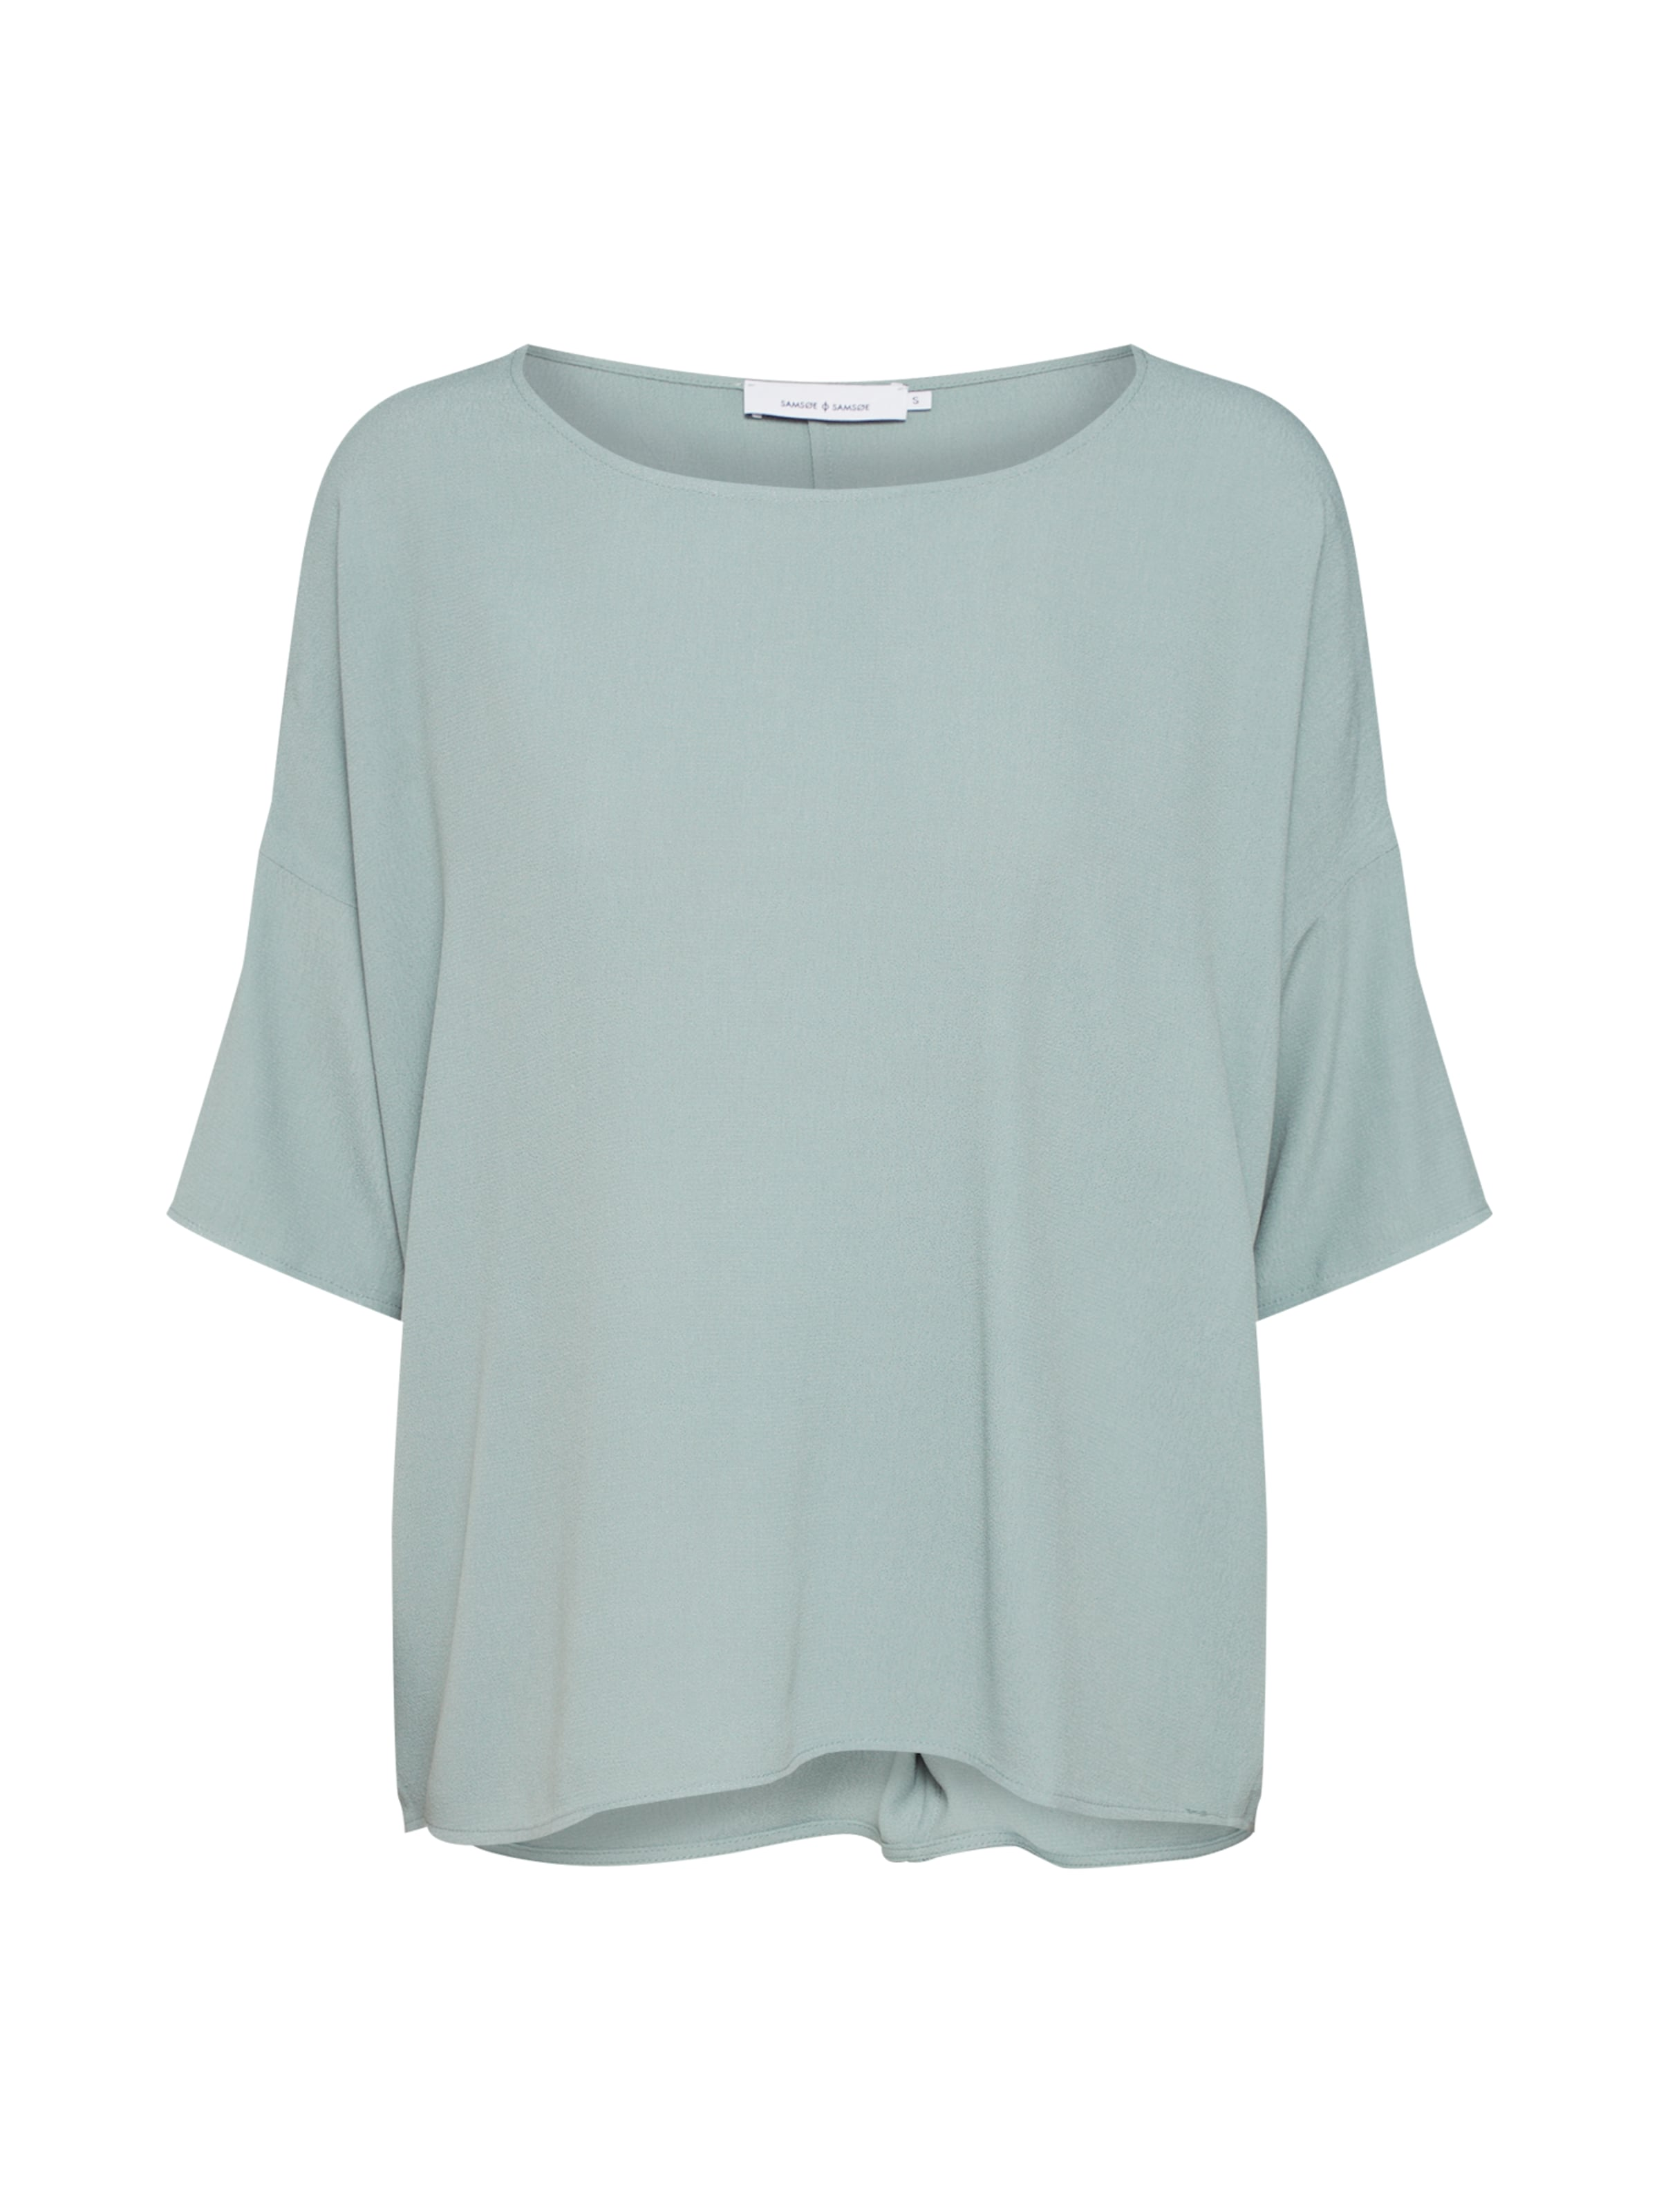 Bluse Bluse Samsoeamp; Hellgrün 'mains' 'mains' In Samsoeamp; drCshtQxB